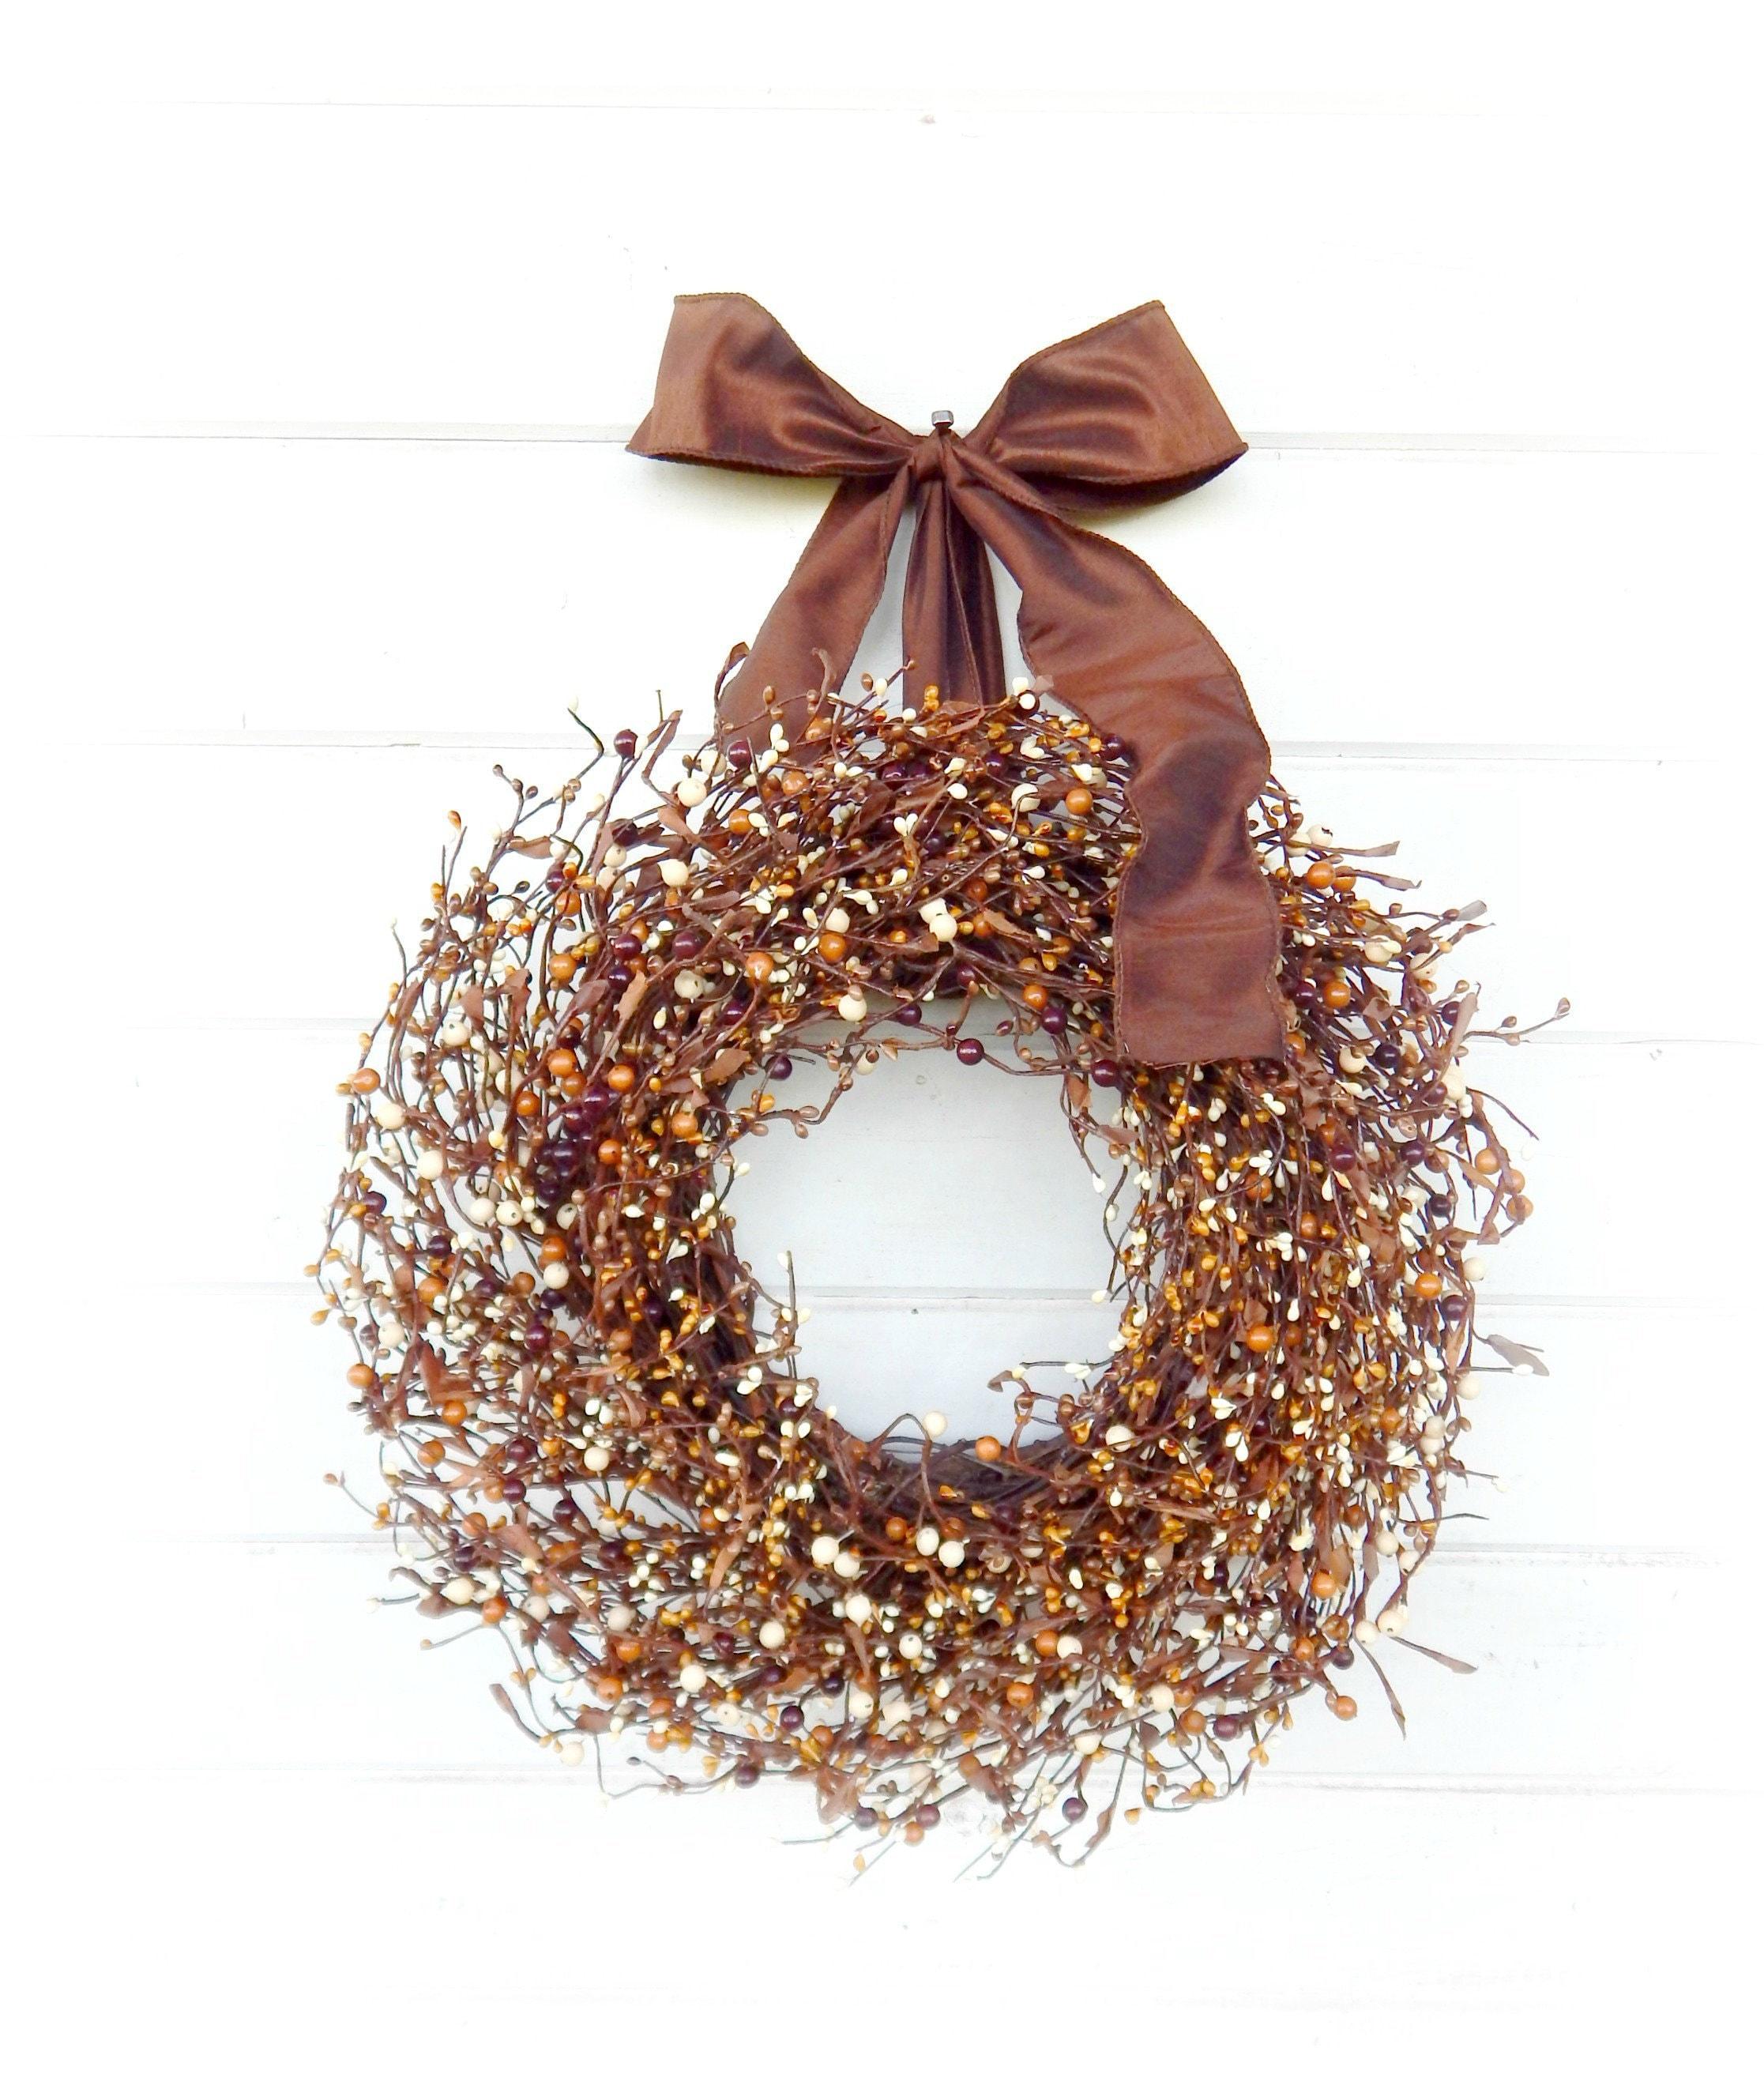 Home Decor Wreaths: Fall Wreath-Fall Decor-Brown Wreath-Rustic Home Decor